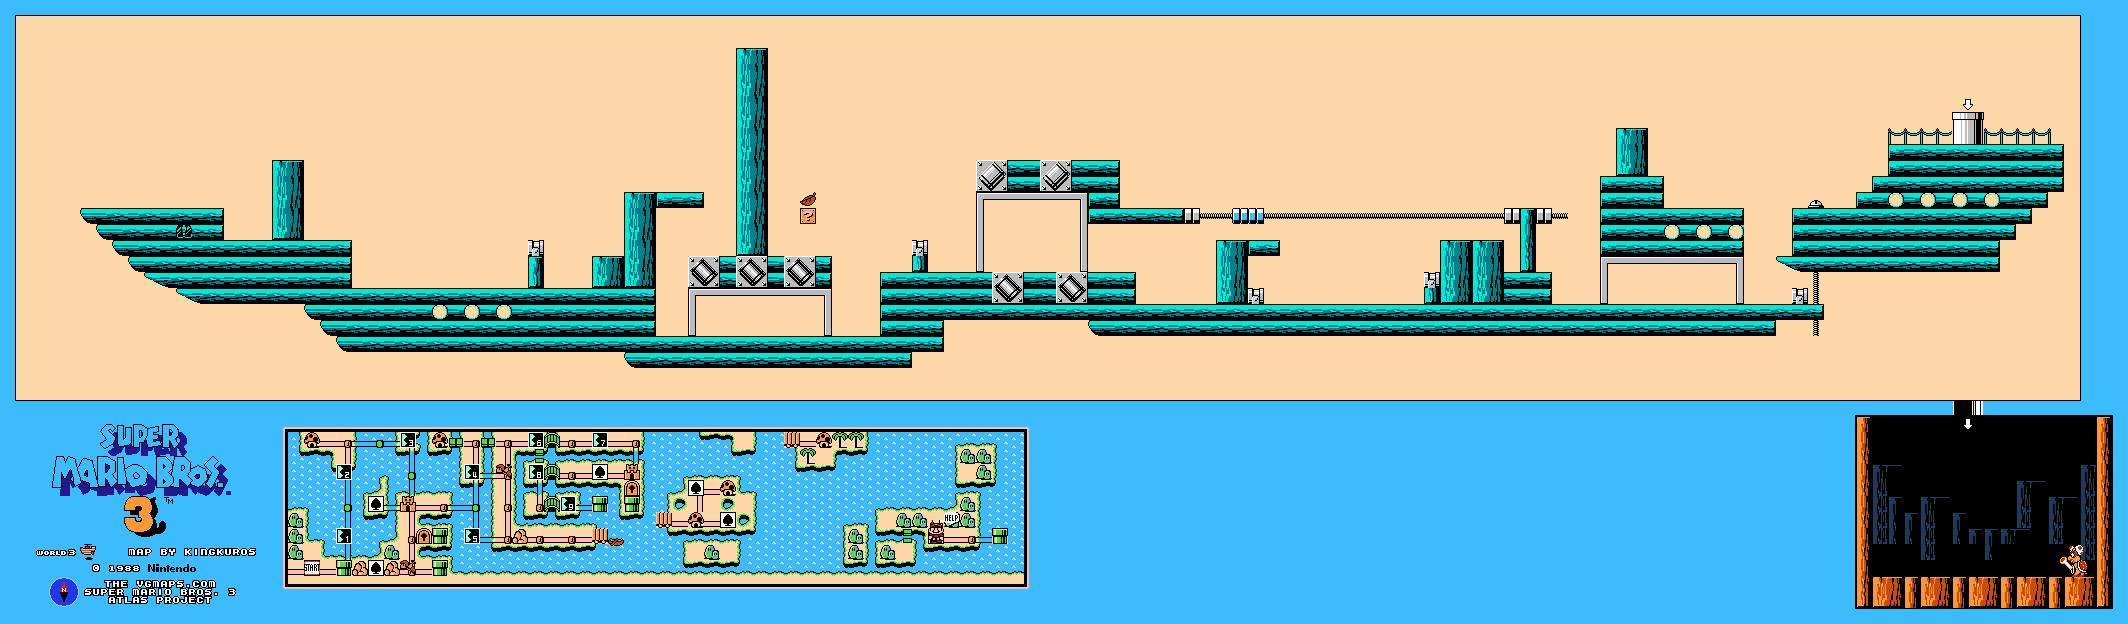 InstallerFree: Mario Bros Game Map